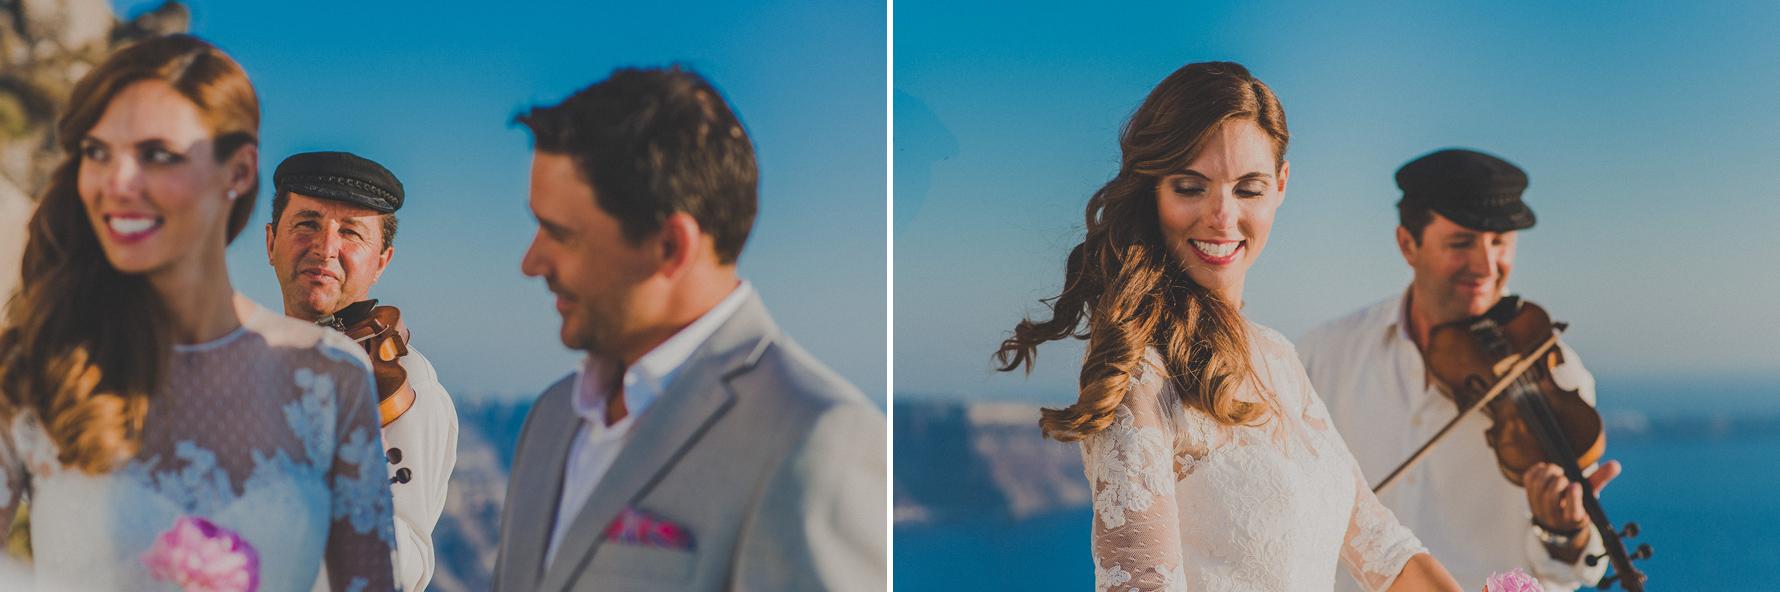 elopement-in-santorini-grace-hotels-dancing-in-the-sunset